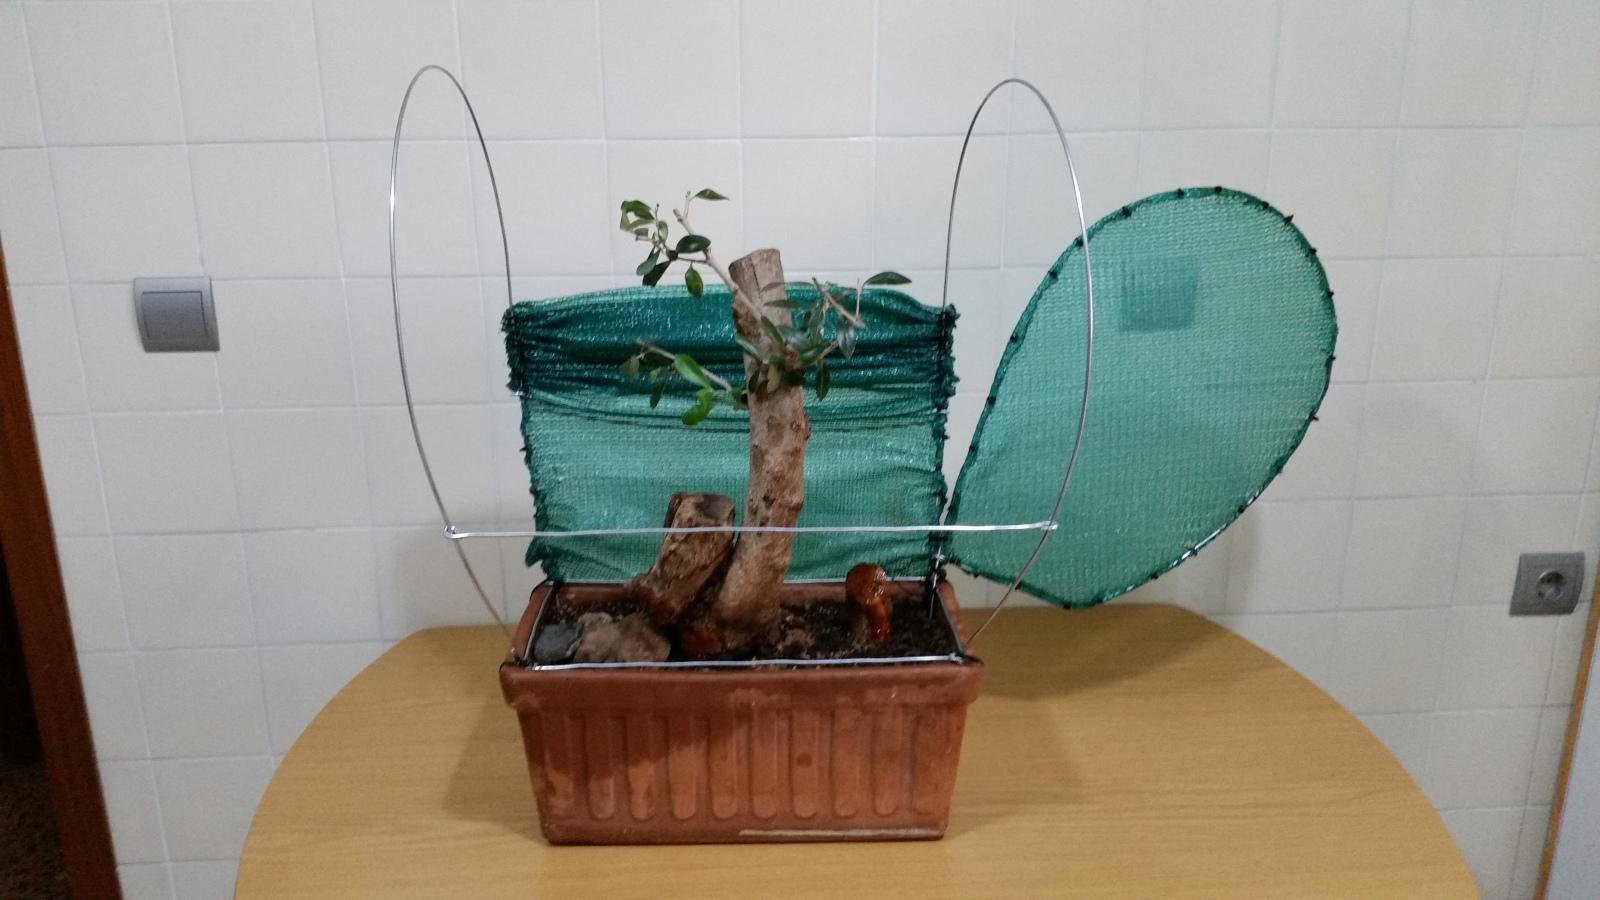 esqueje de tronco de olivo 295wqcg